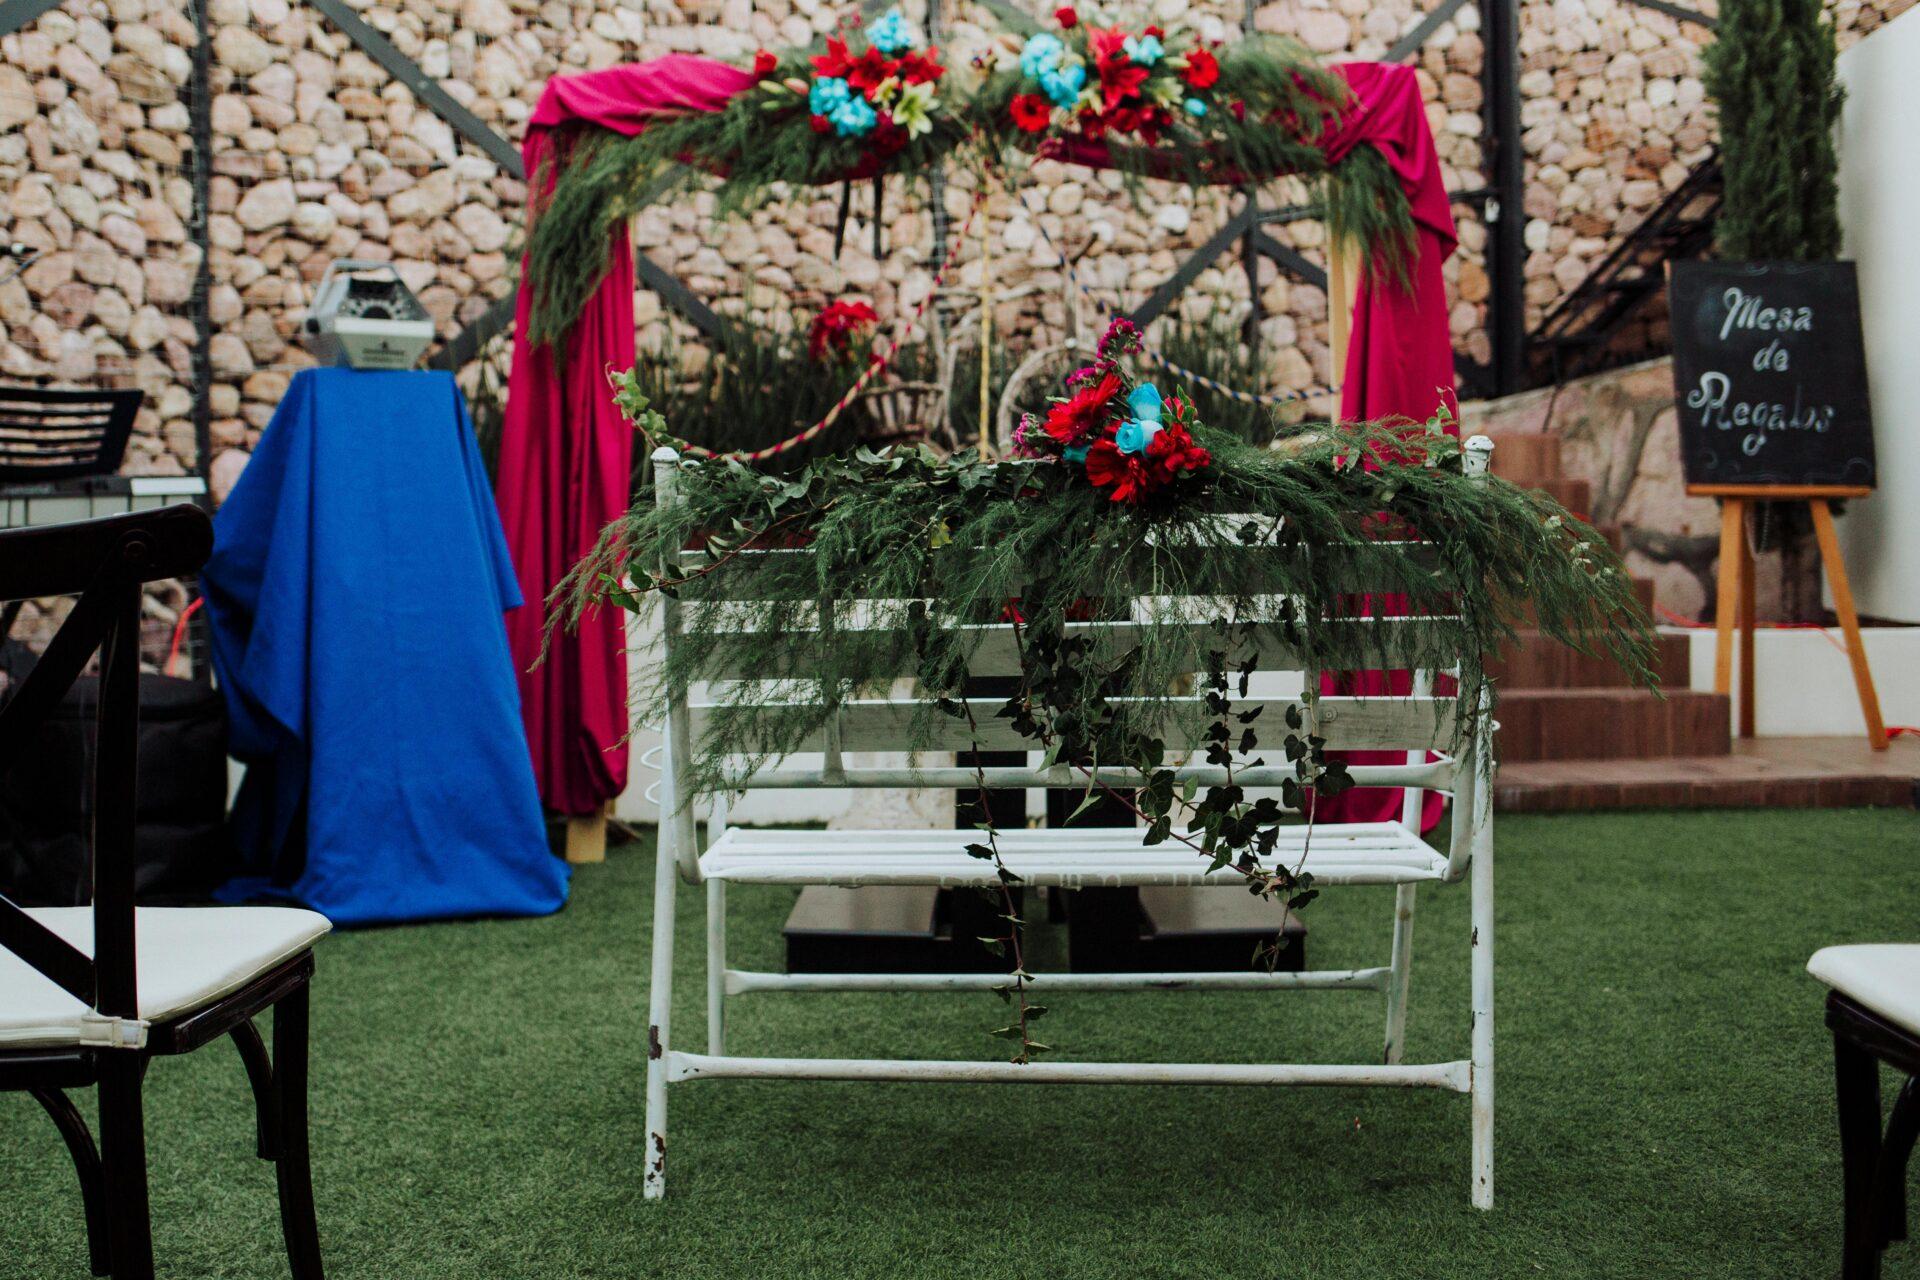 javier_noriega_fotografo_bodas_gaviones_zacatecas_wedding_photographer20